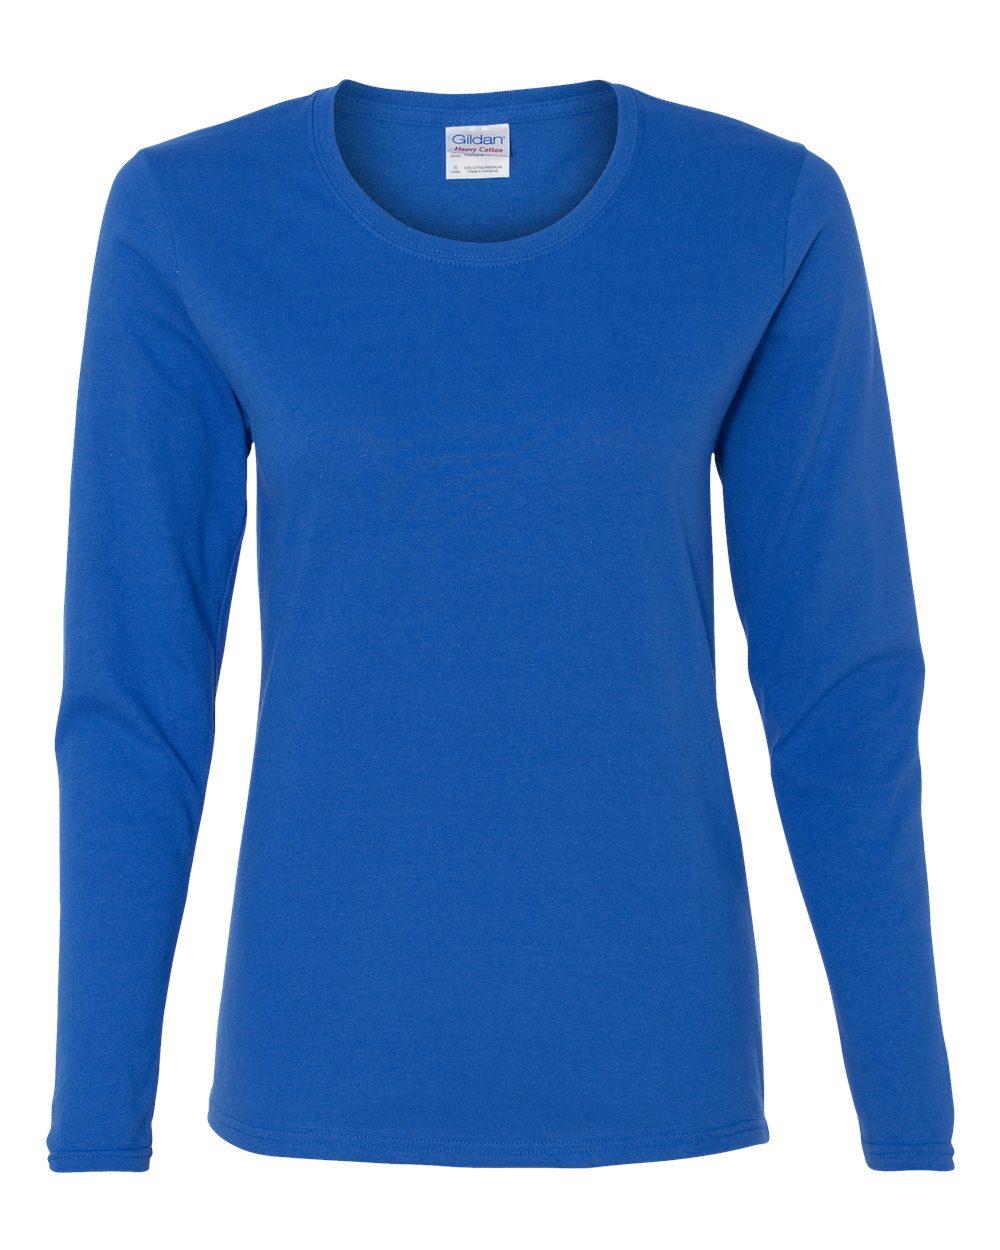 Gildan 5400L - Heavy Cotton Missy Fit Long Sleeve T-Shirt  21f3929994